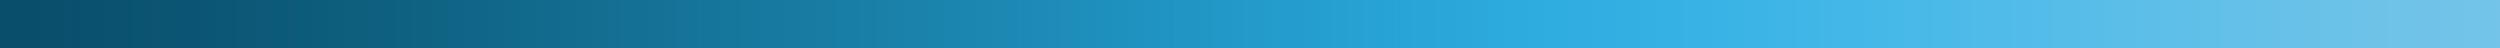 MTW_gradientline-thin.jpg